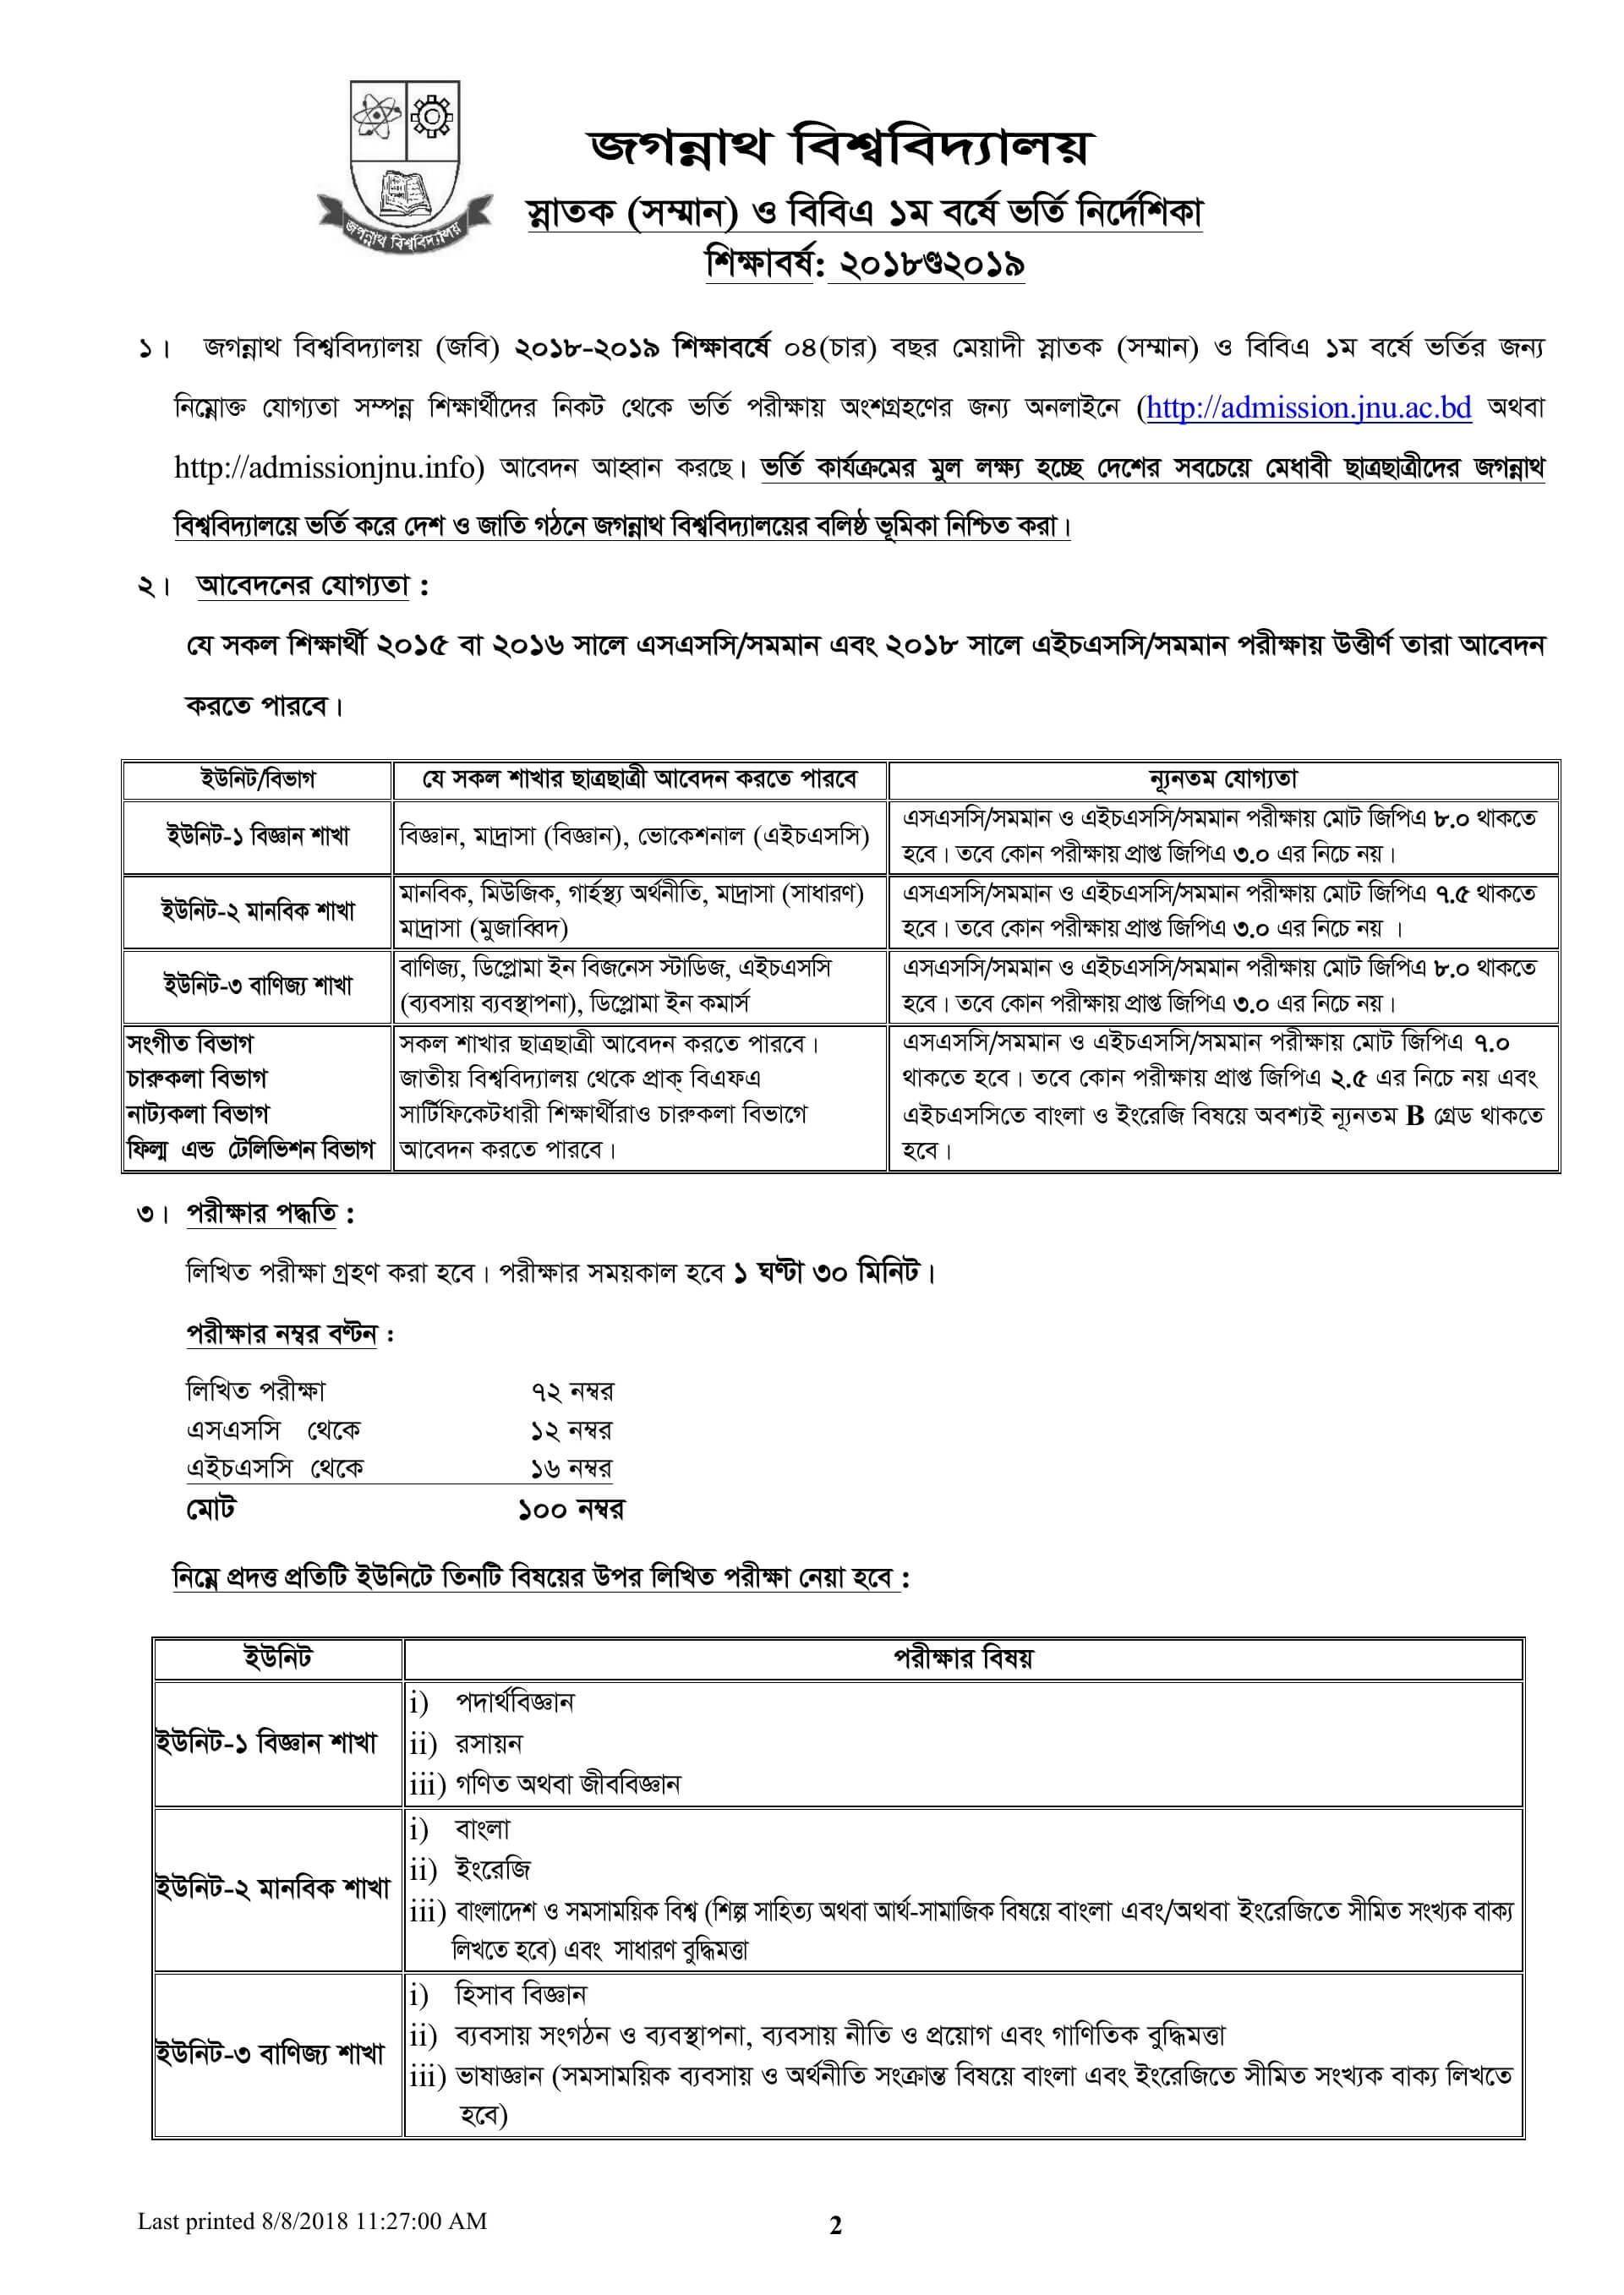 Jagannath University Admission Guideline-1